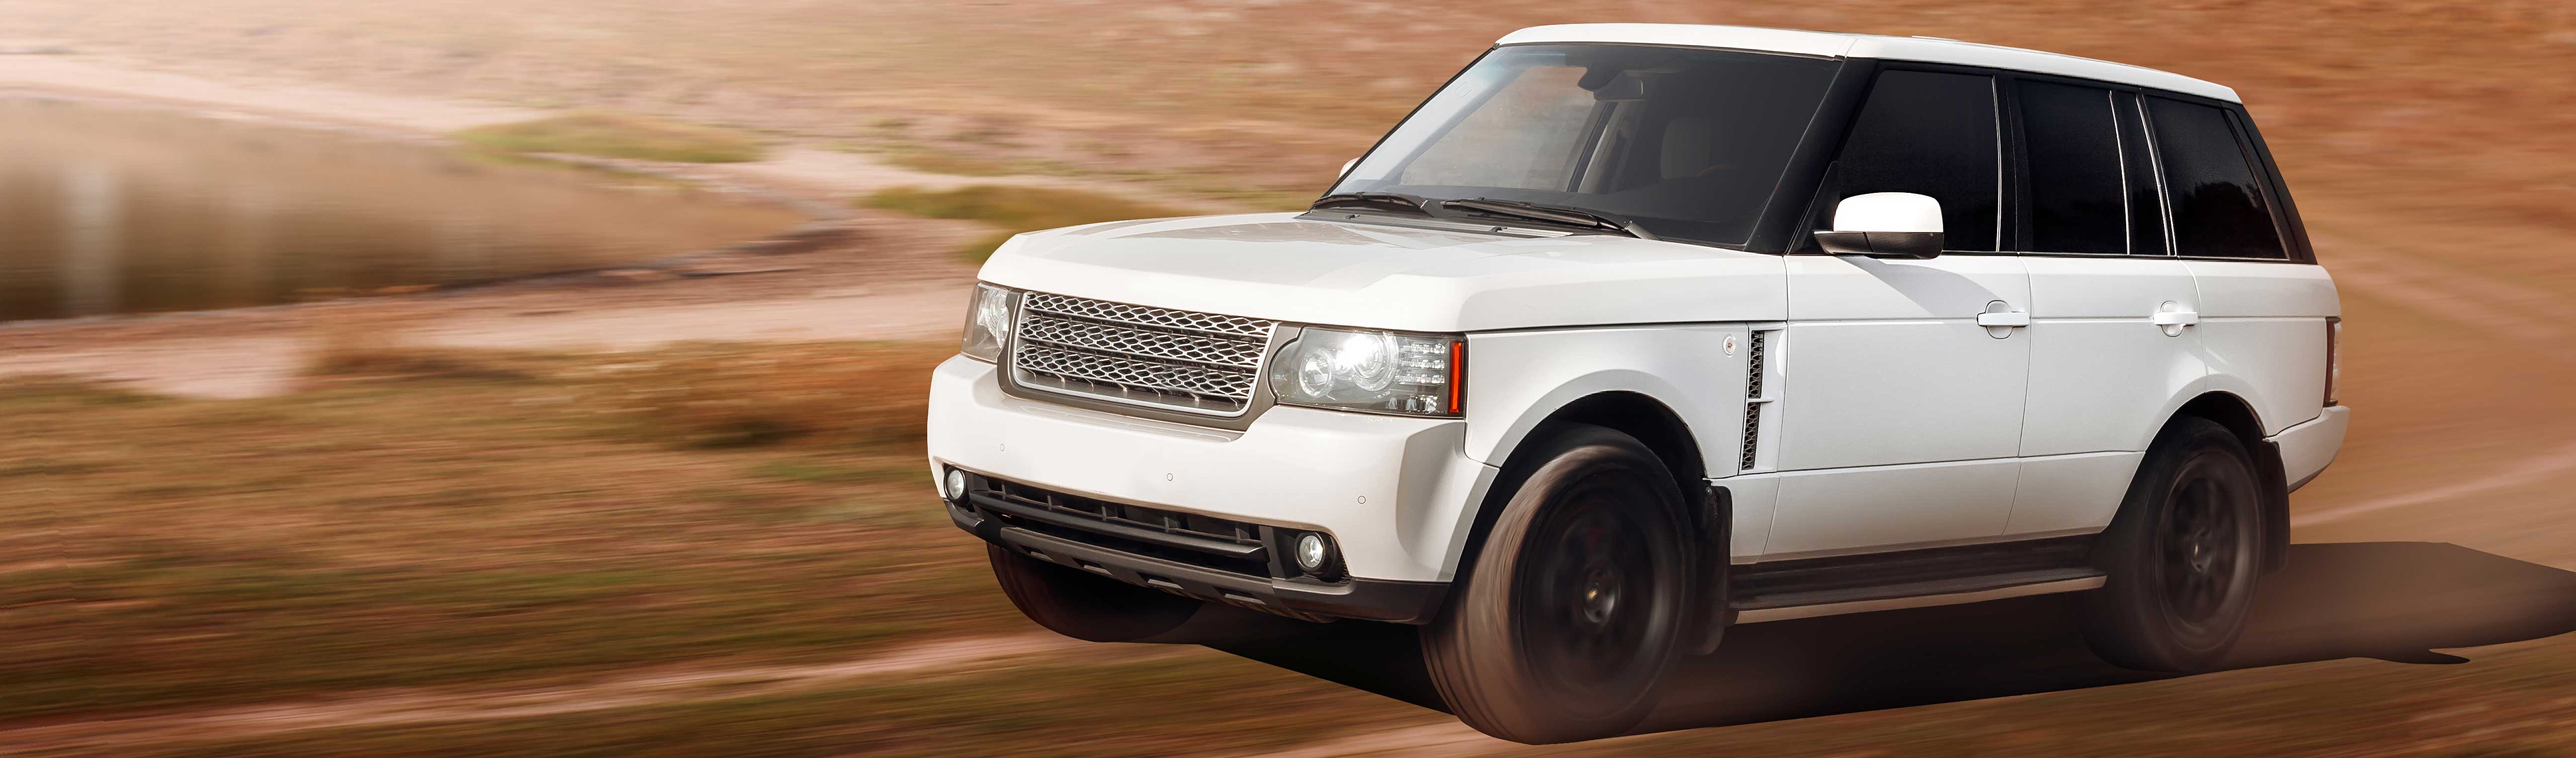 slrbooking-range-rover